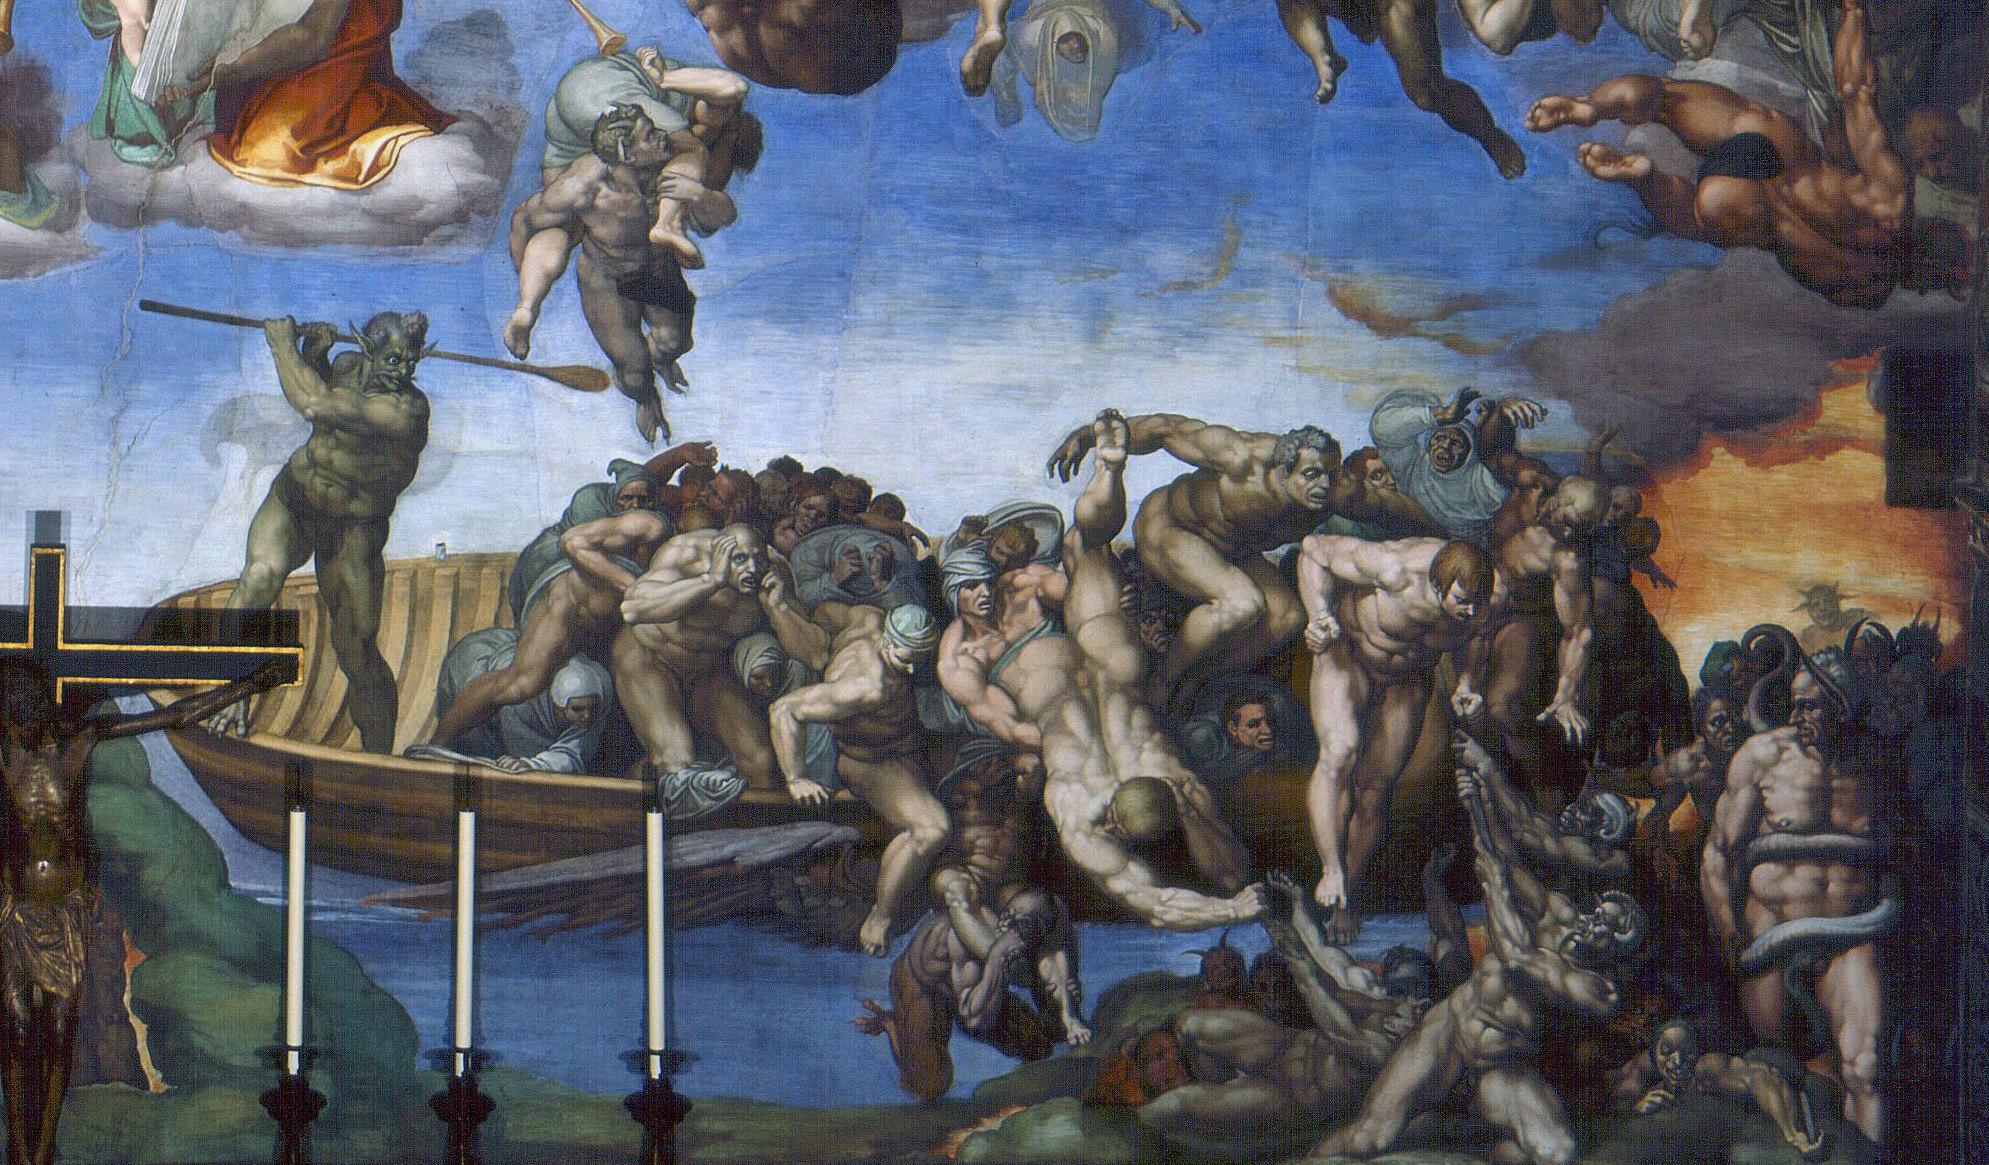 Michelangelo. The Last Judgment. Sistine Chapel, Vatican City. 1541. Fresco. Charon.